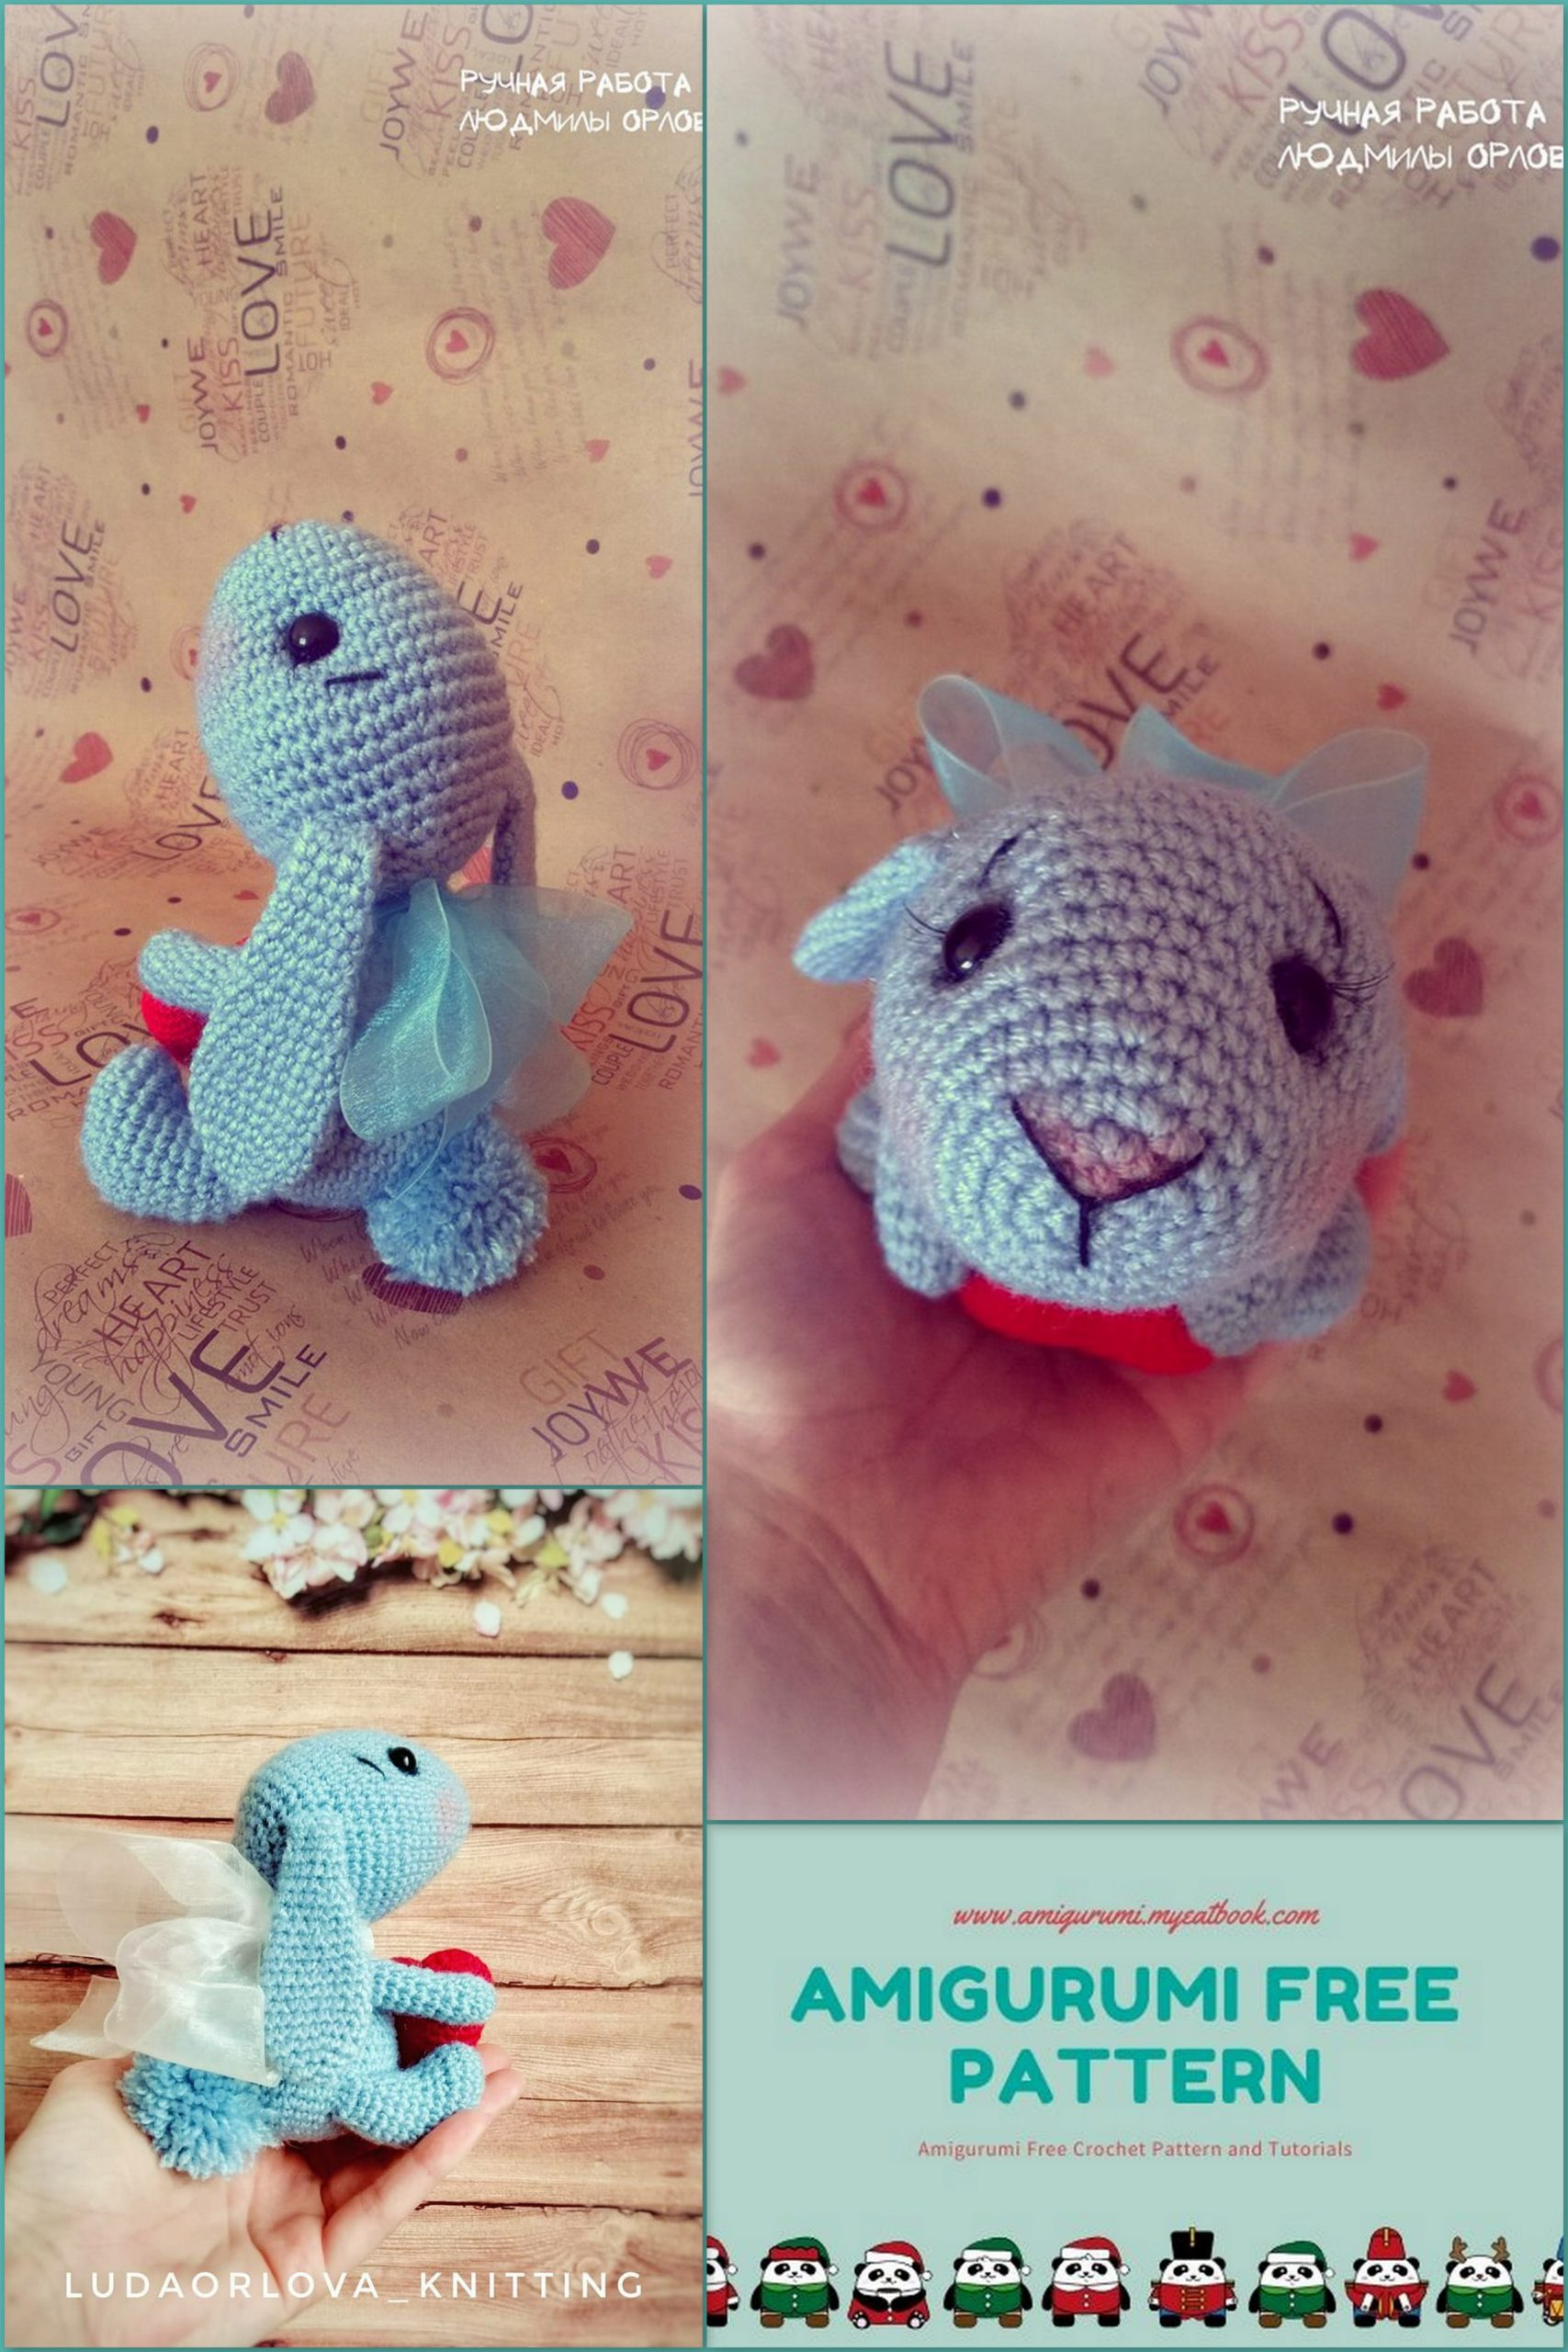 Little Muggles | Knit amigurumi with Free Pattern! | 2560x1707